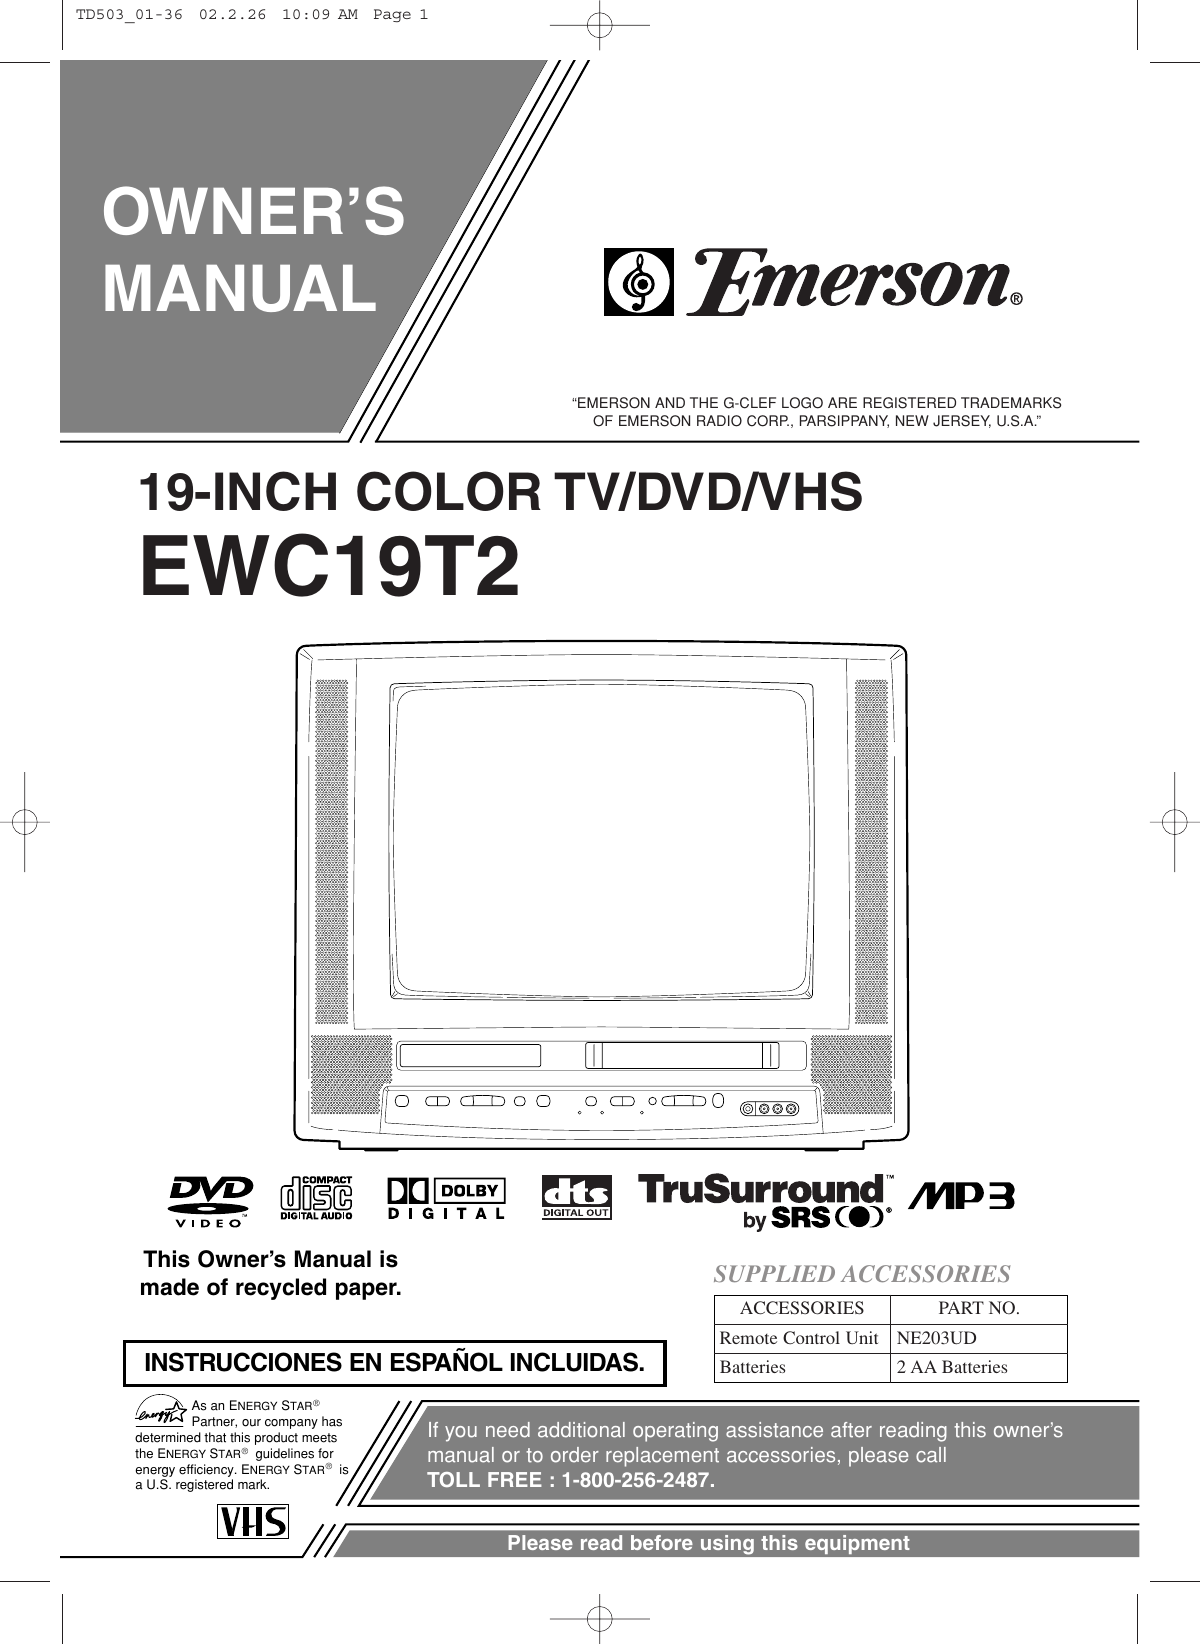 emerson vcr dvd player manual